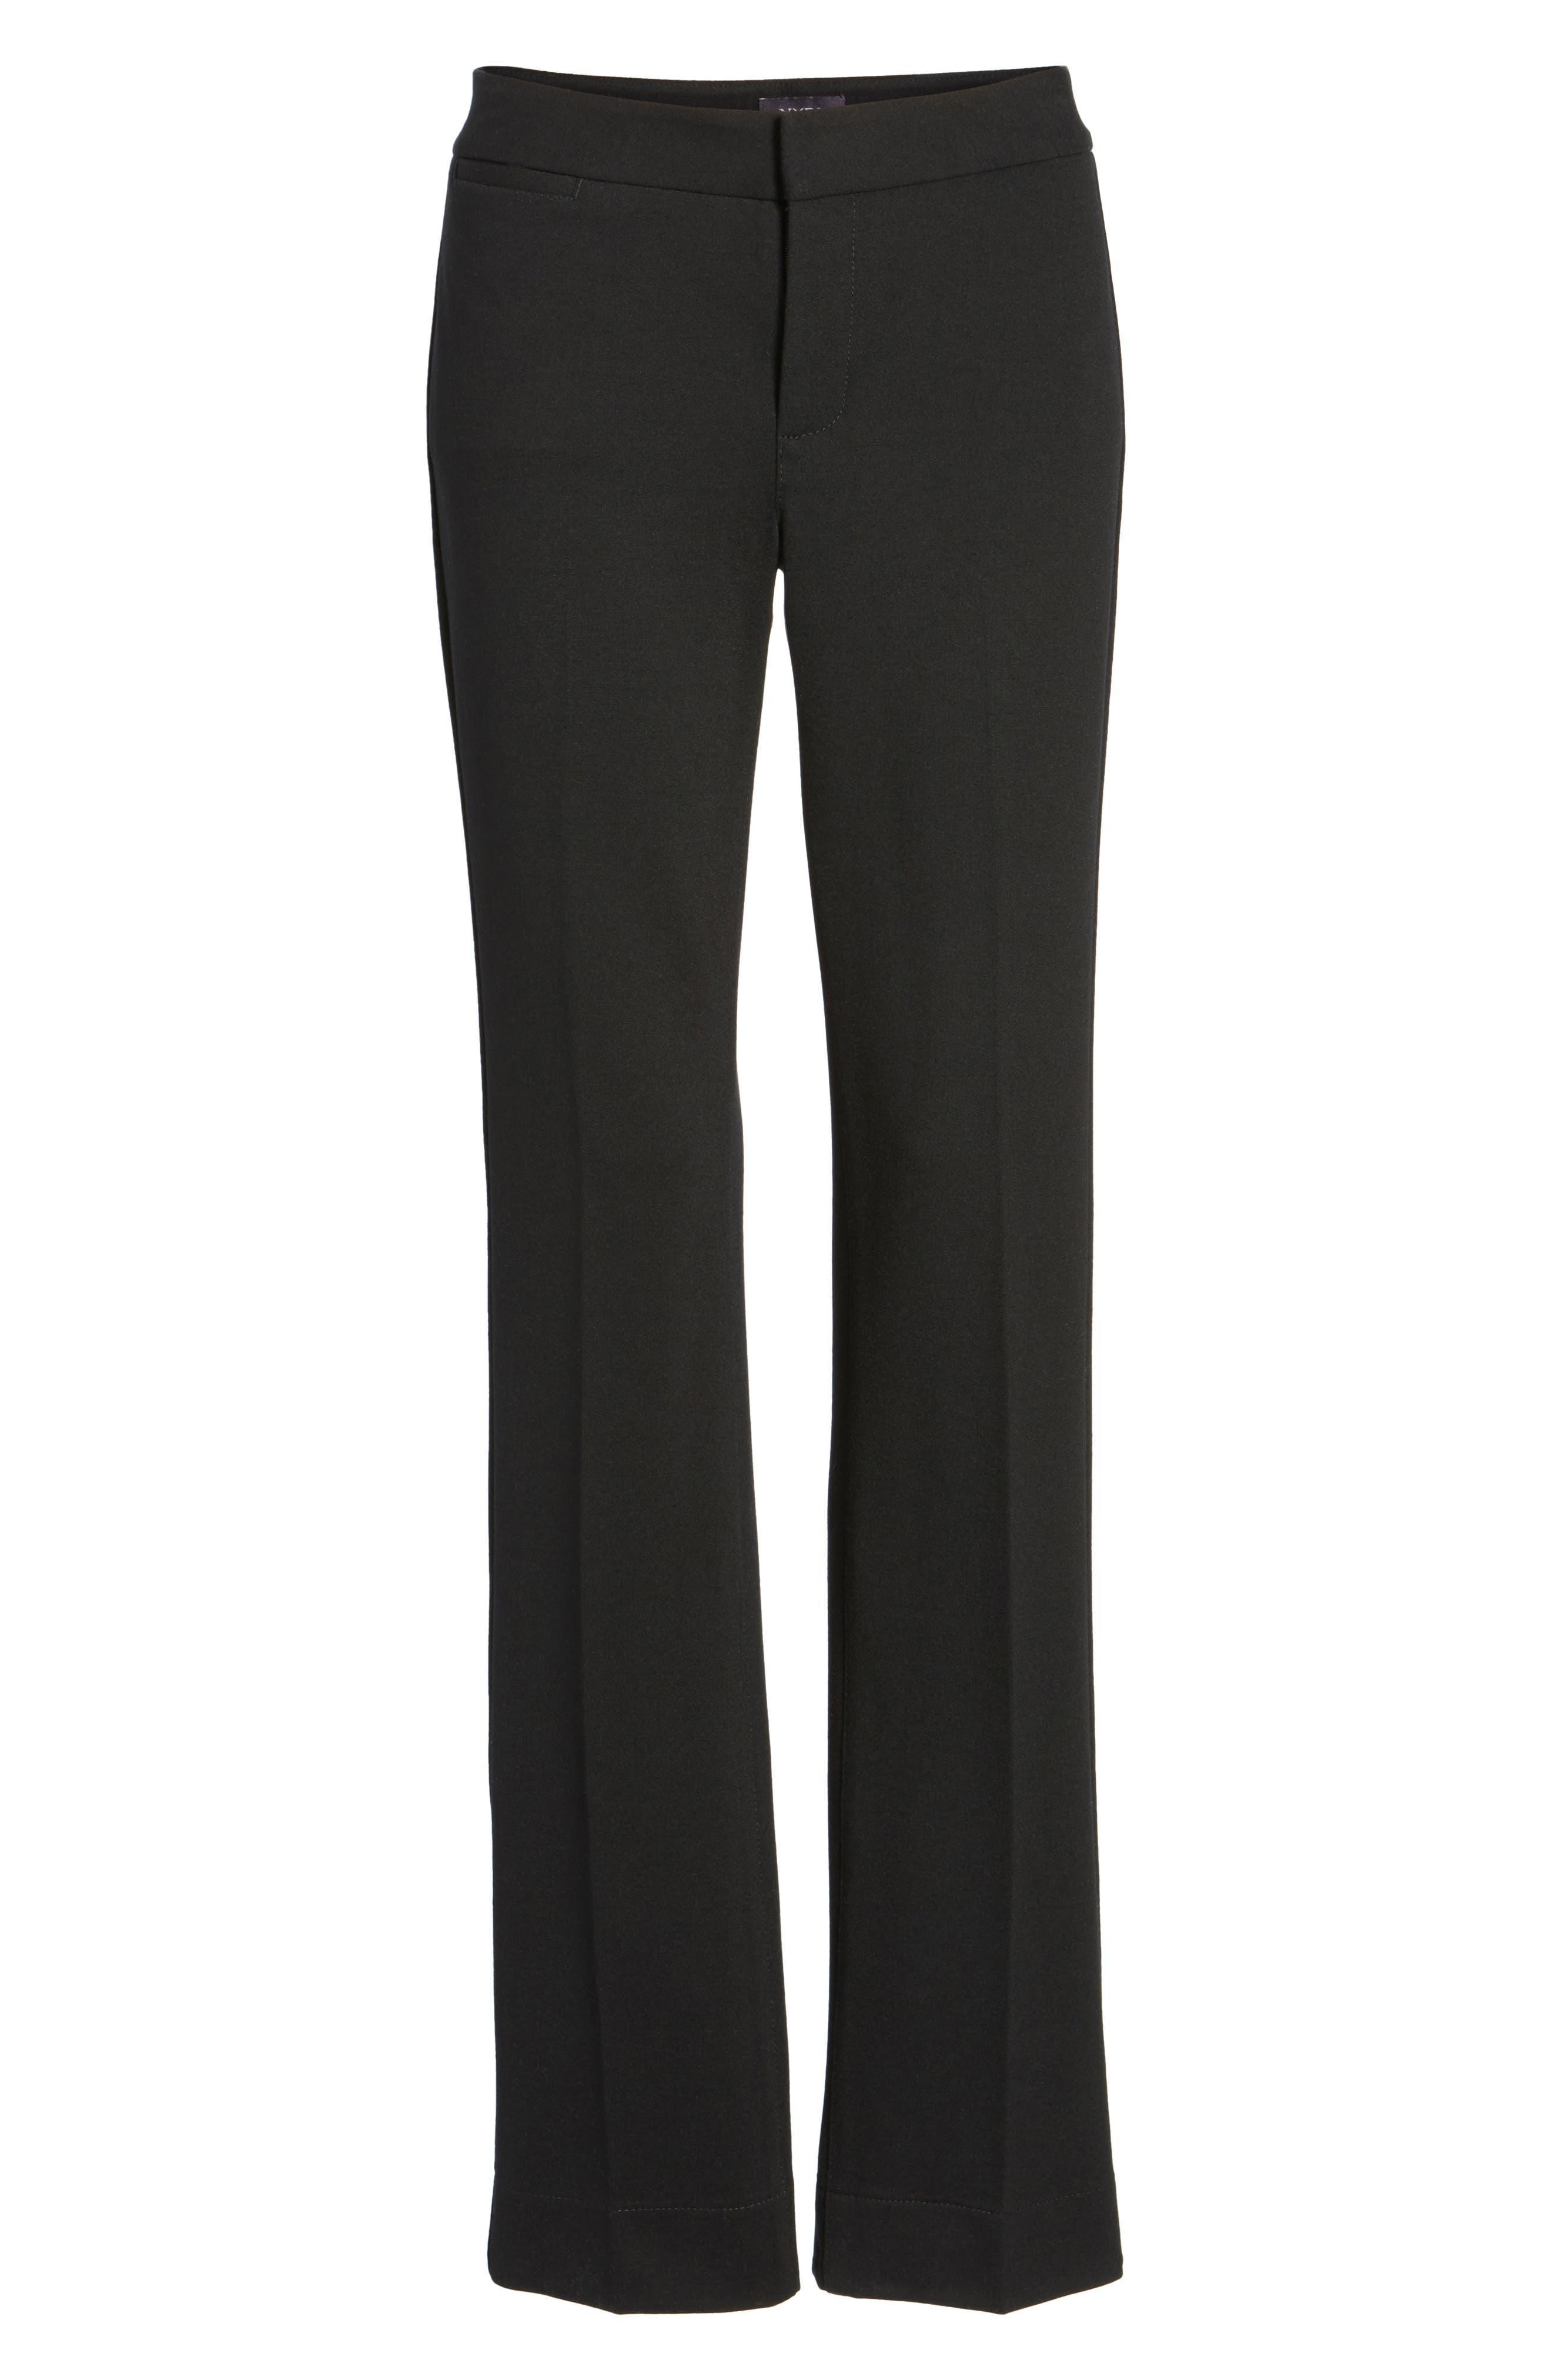 NYDJ, Stretch Knit Trousers, Alternate thumbnail 7, color, BLACK